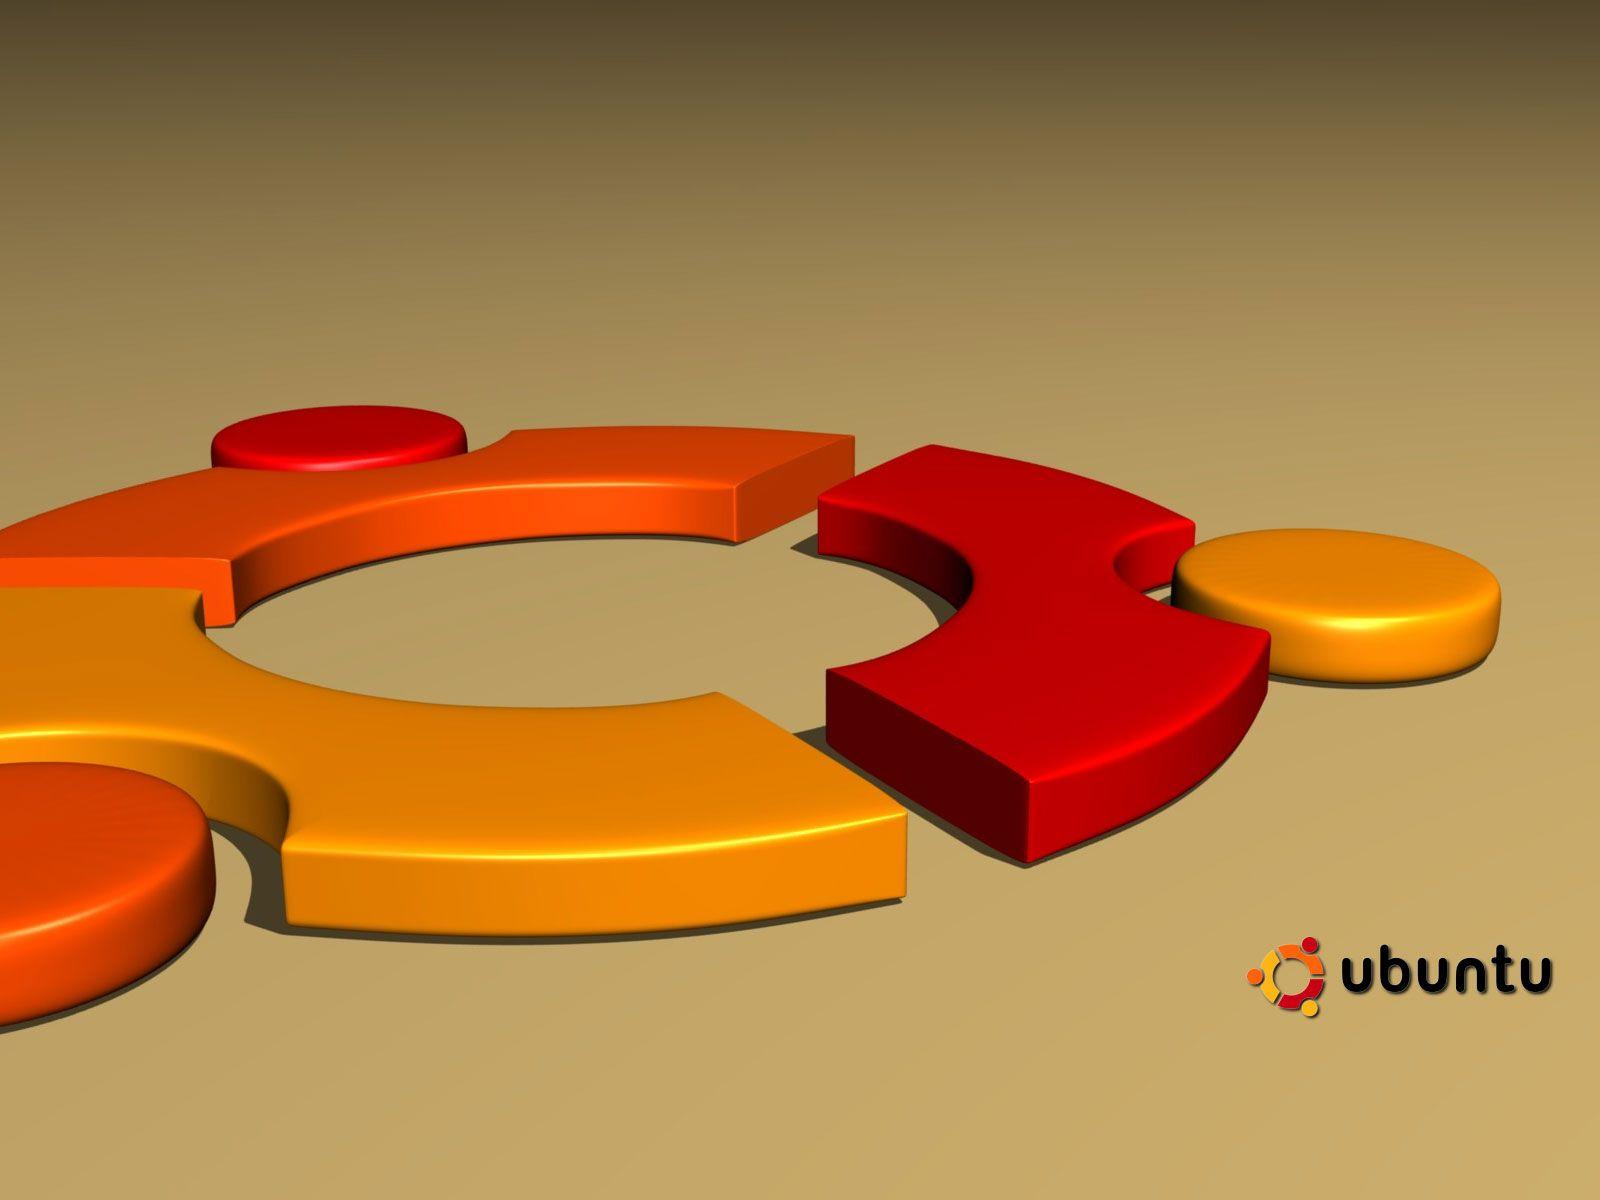 ubuntu 3d logo wallpaper hd httpimashon combrands